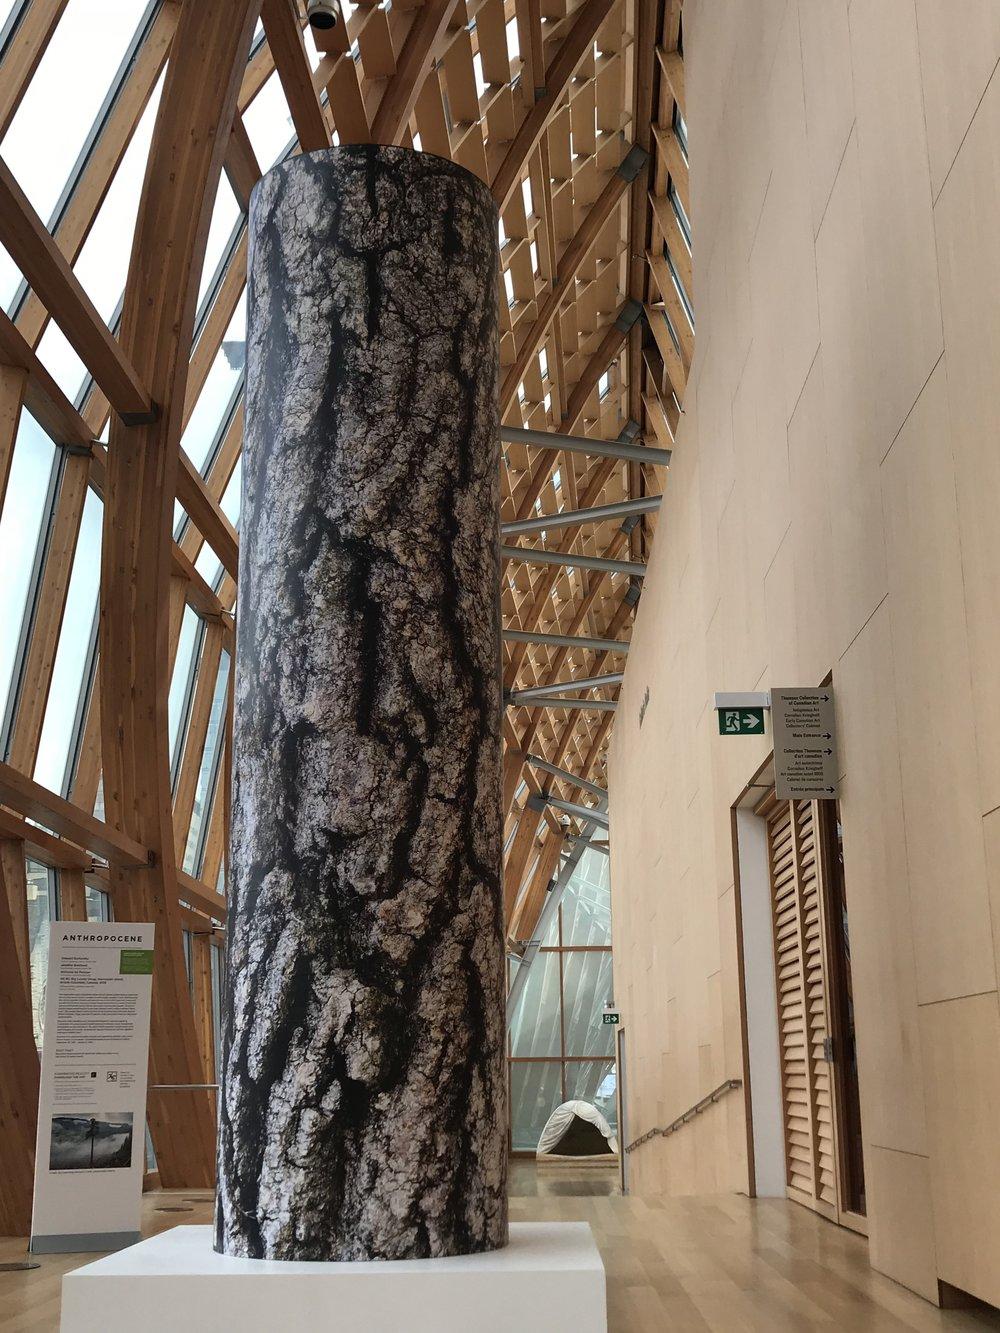 Big Lonely Doug in Galleria Italia. Too bad AR didn't work.